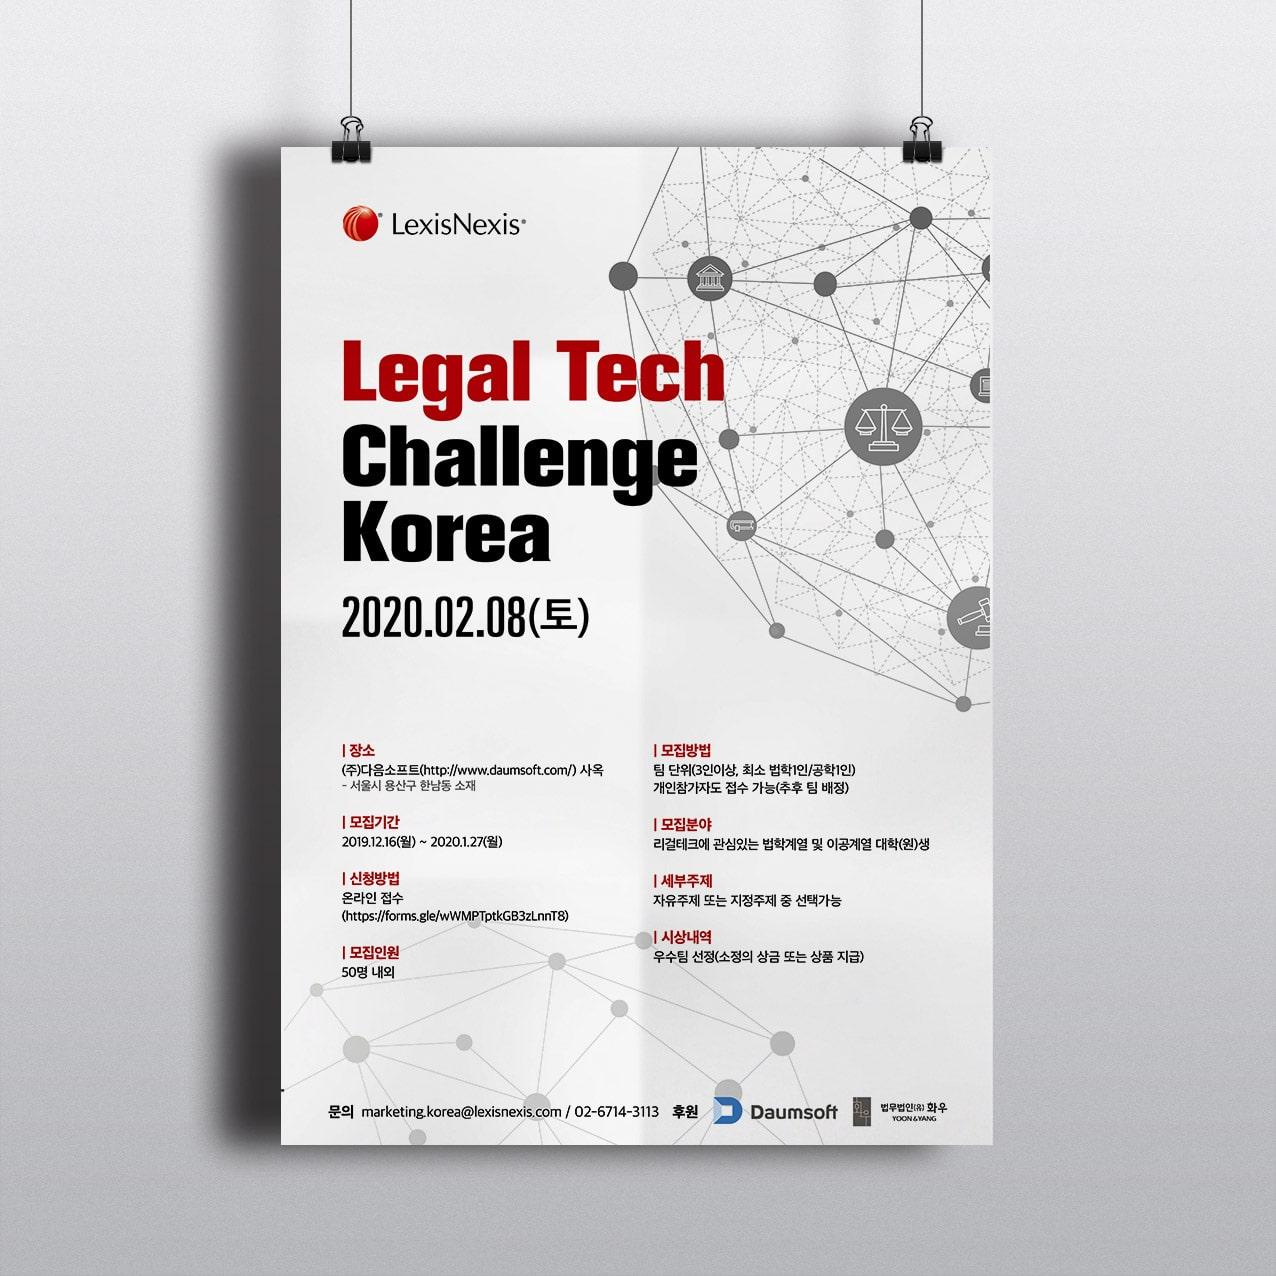 Legal Tech Challenge Korea 포스터 디자인 시안 - 렉시스넥시스